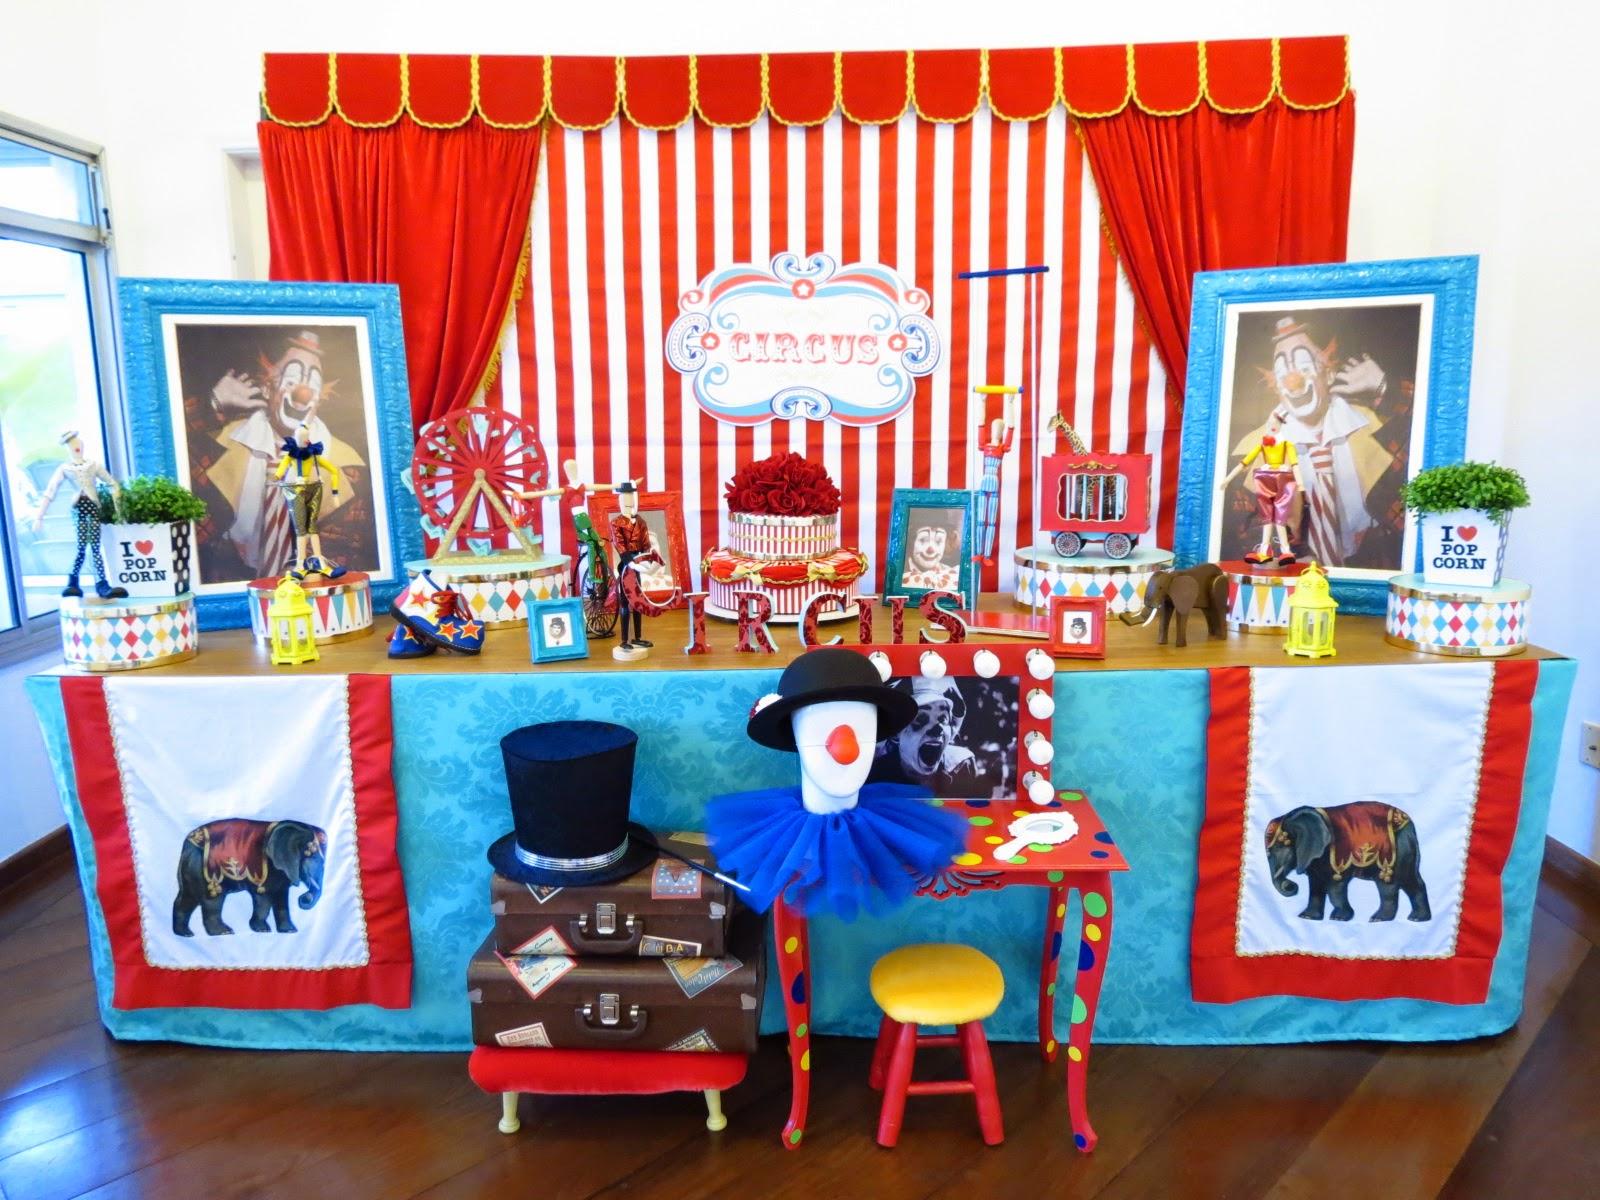 http://farolitadecoracoes.blogspot.com.br/search/label/circo